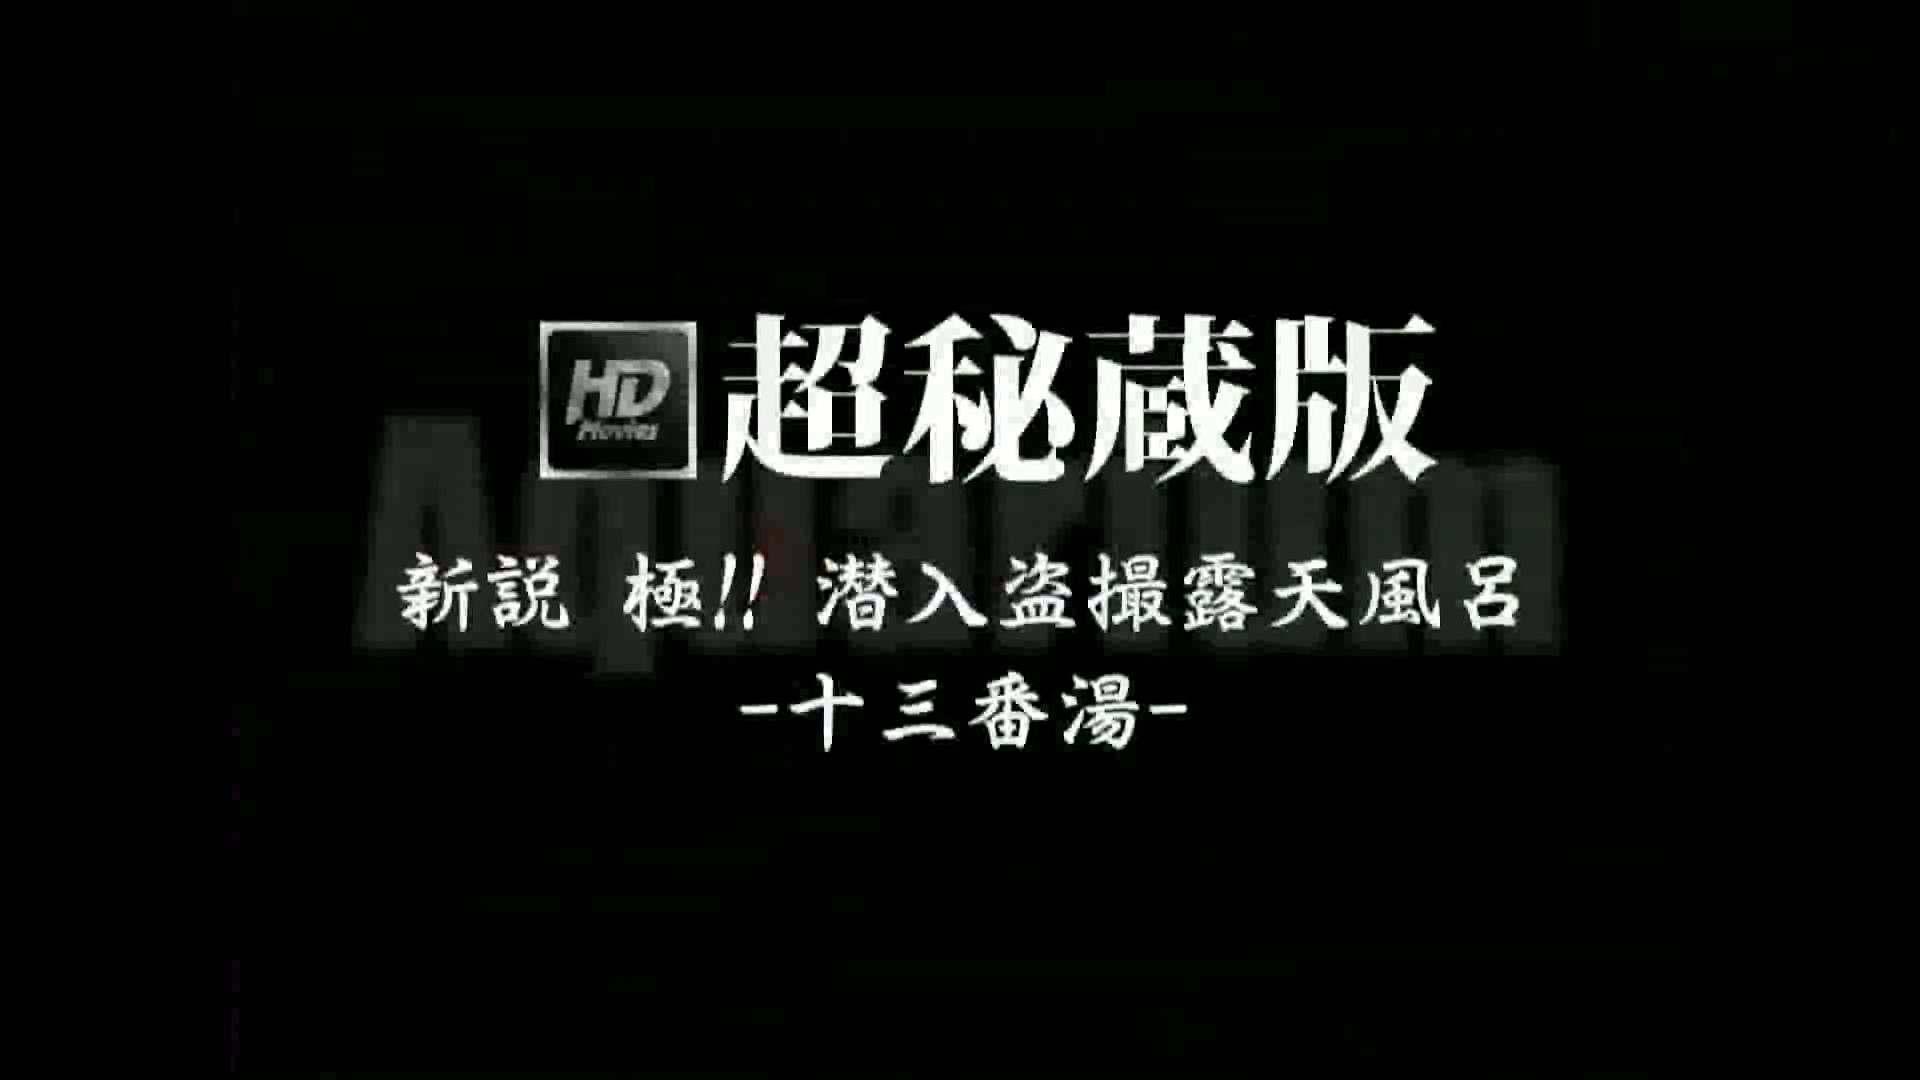 Aquaな露天風呂Vol.877潜入盗撮露天風呂十三判湯 其の四 盗撮 オマンコ動画キャプチャ 50画像 2